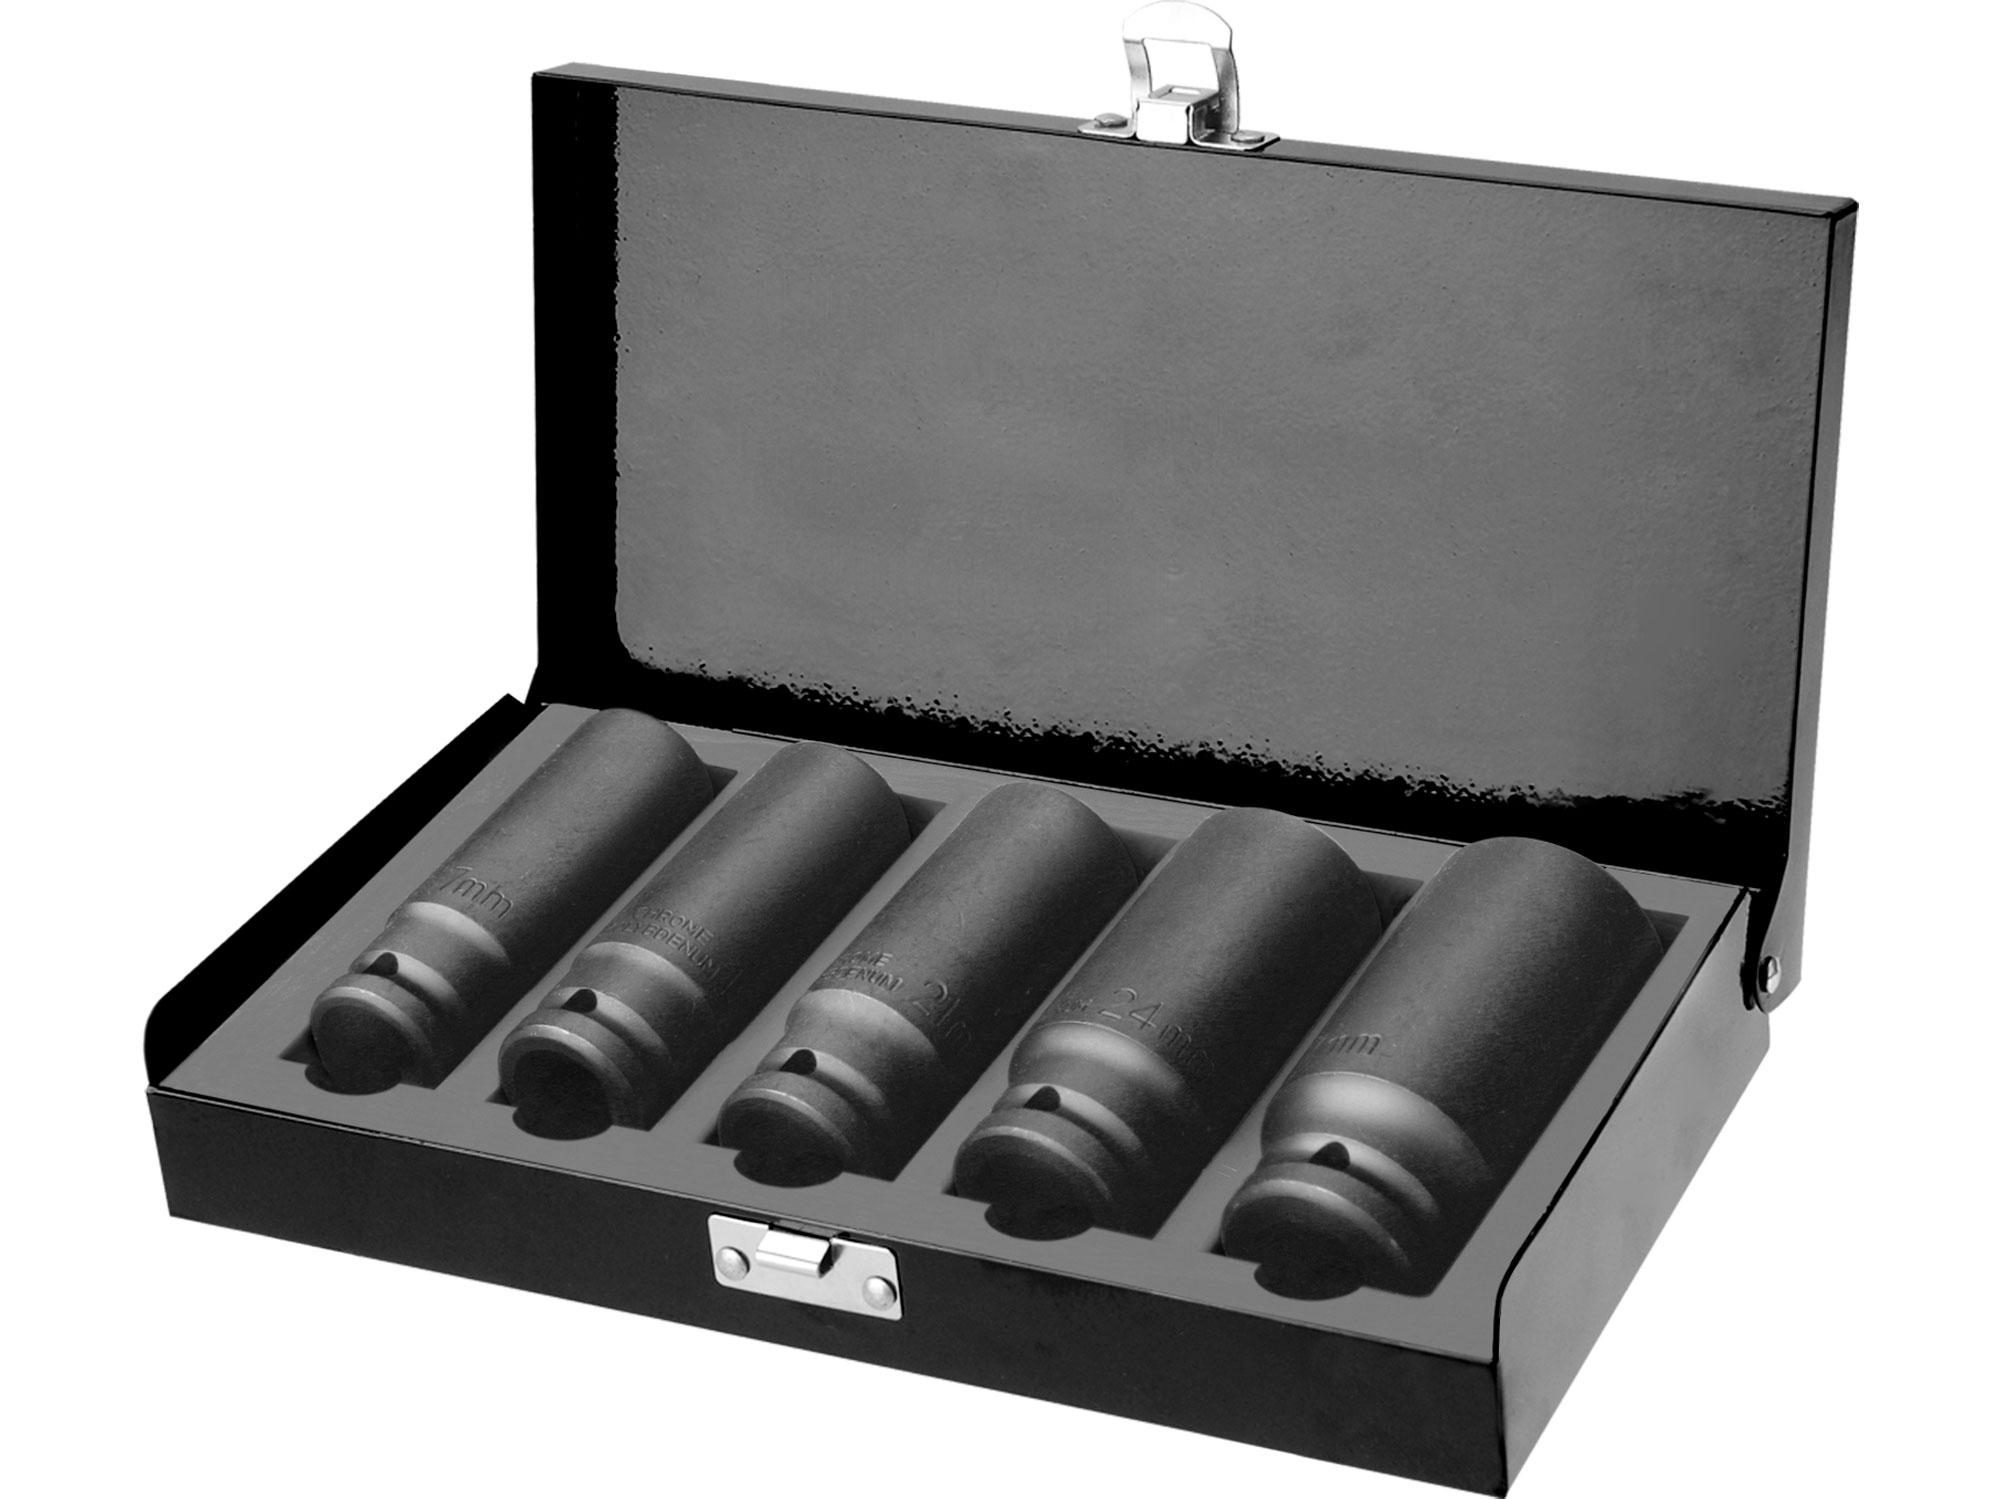 "hlavice nástrčné rázové 1/2"", sada 5ks, 17-27mm, L 79mm"